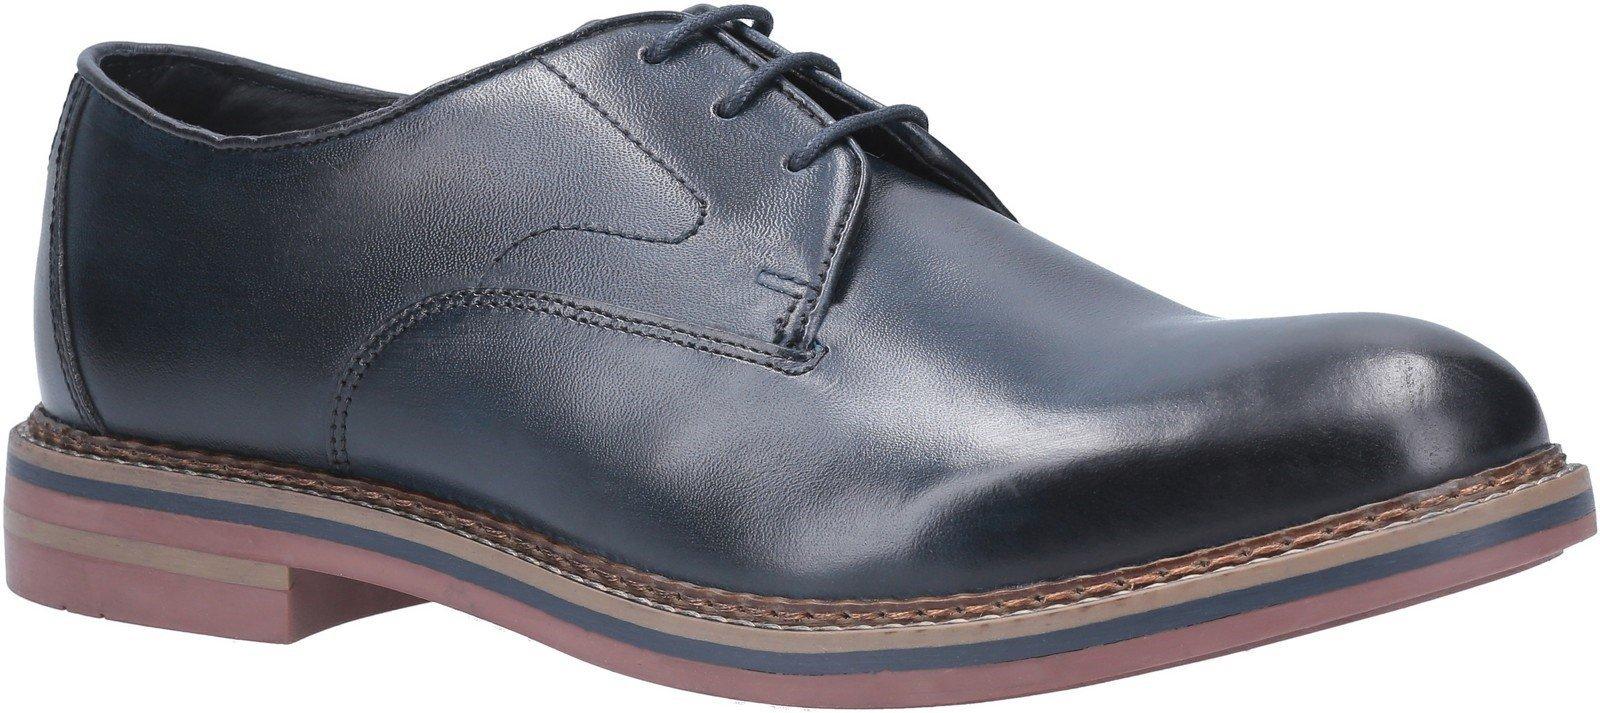 Base London Men's Wayne Burnished Lace Up Shoe Various Colours 29439 - Navy 6